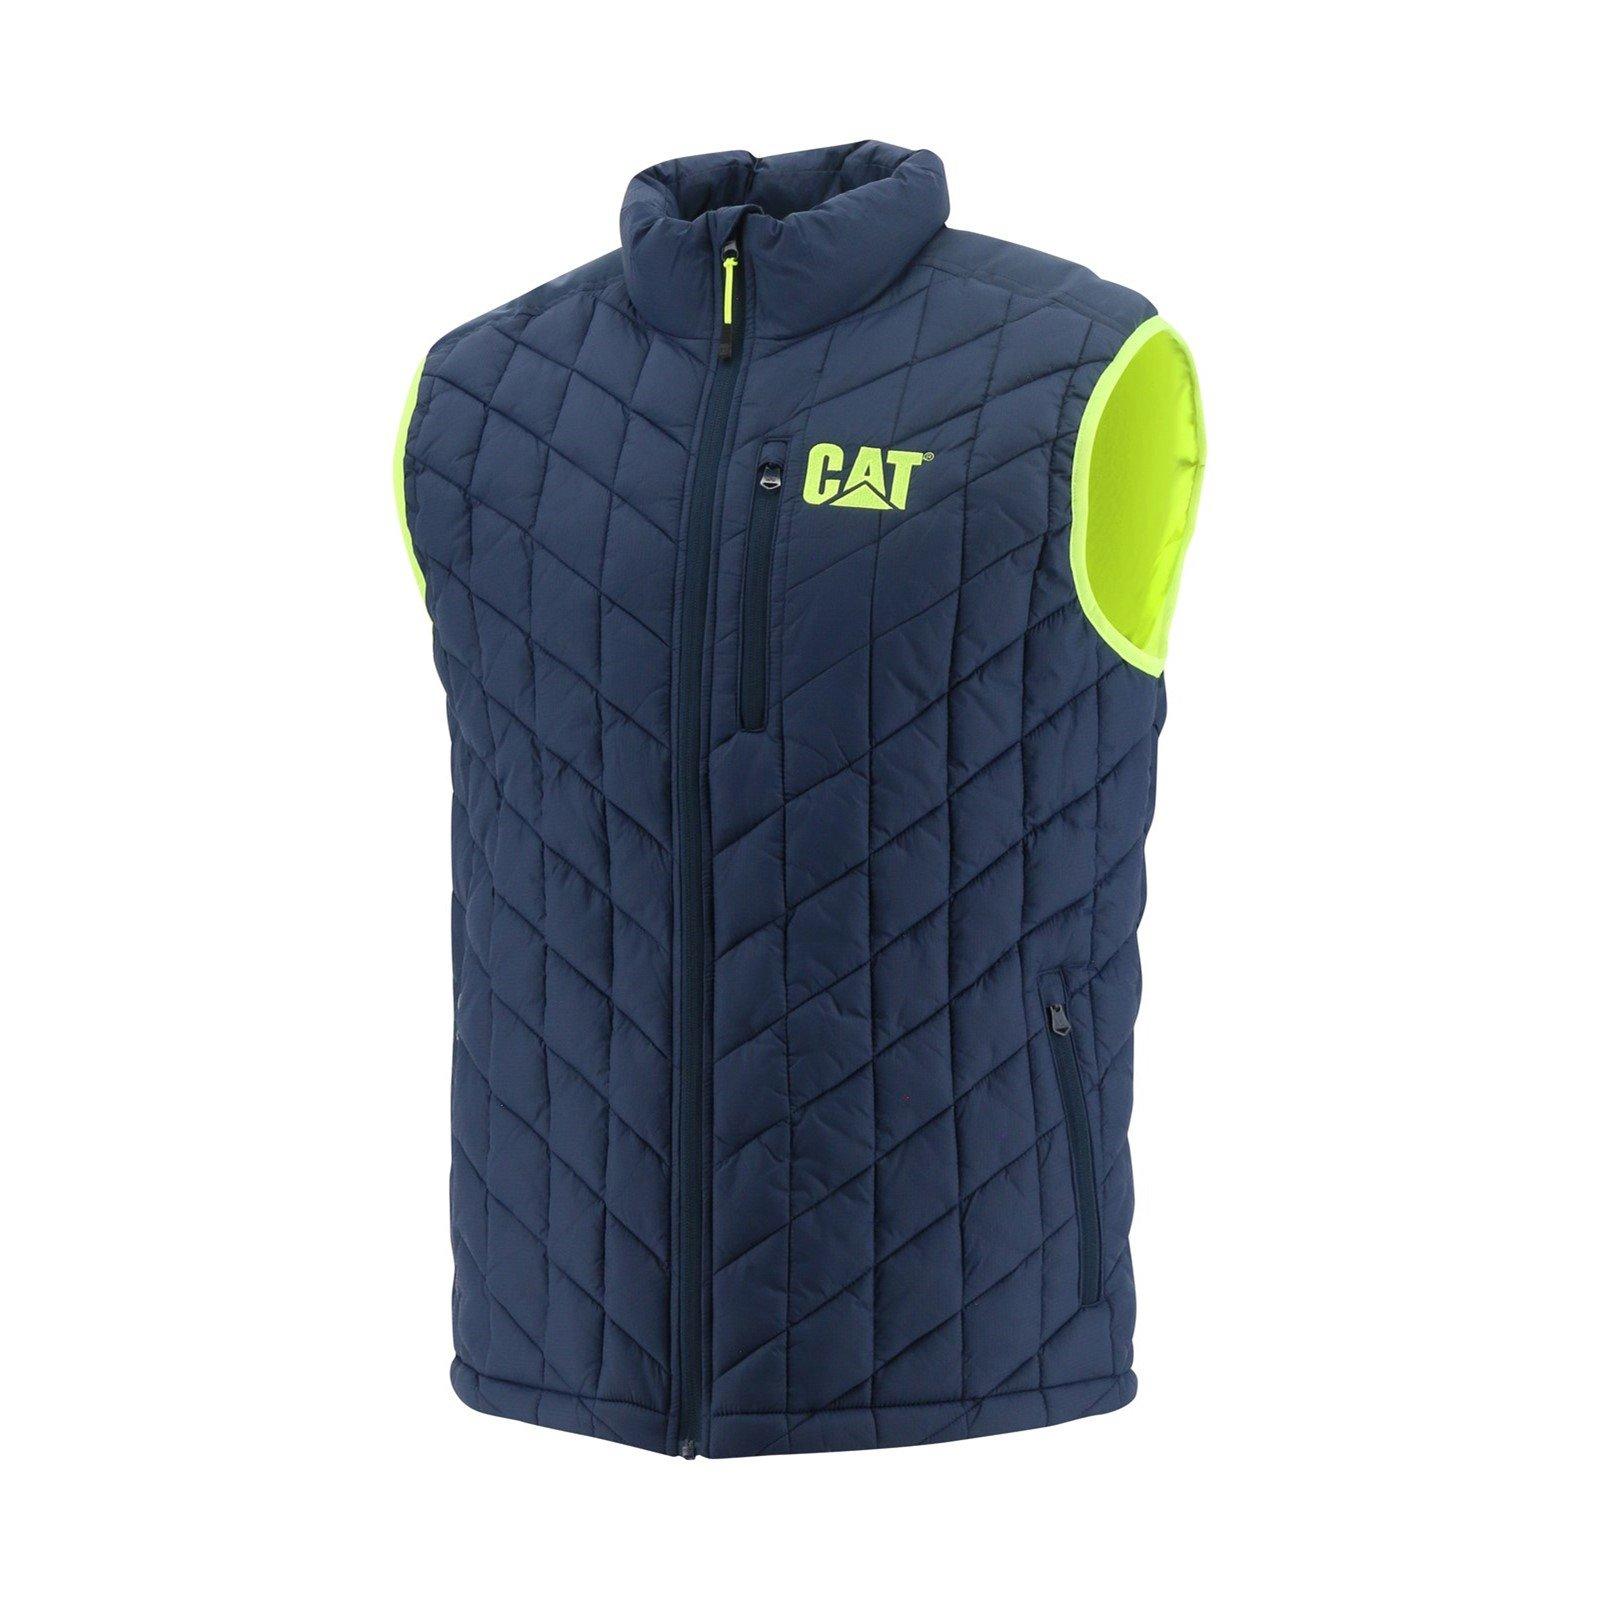 Caterpillar Unisex Insulated Jacket Various Colours 33824 - Detroit Blue Sml